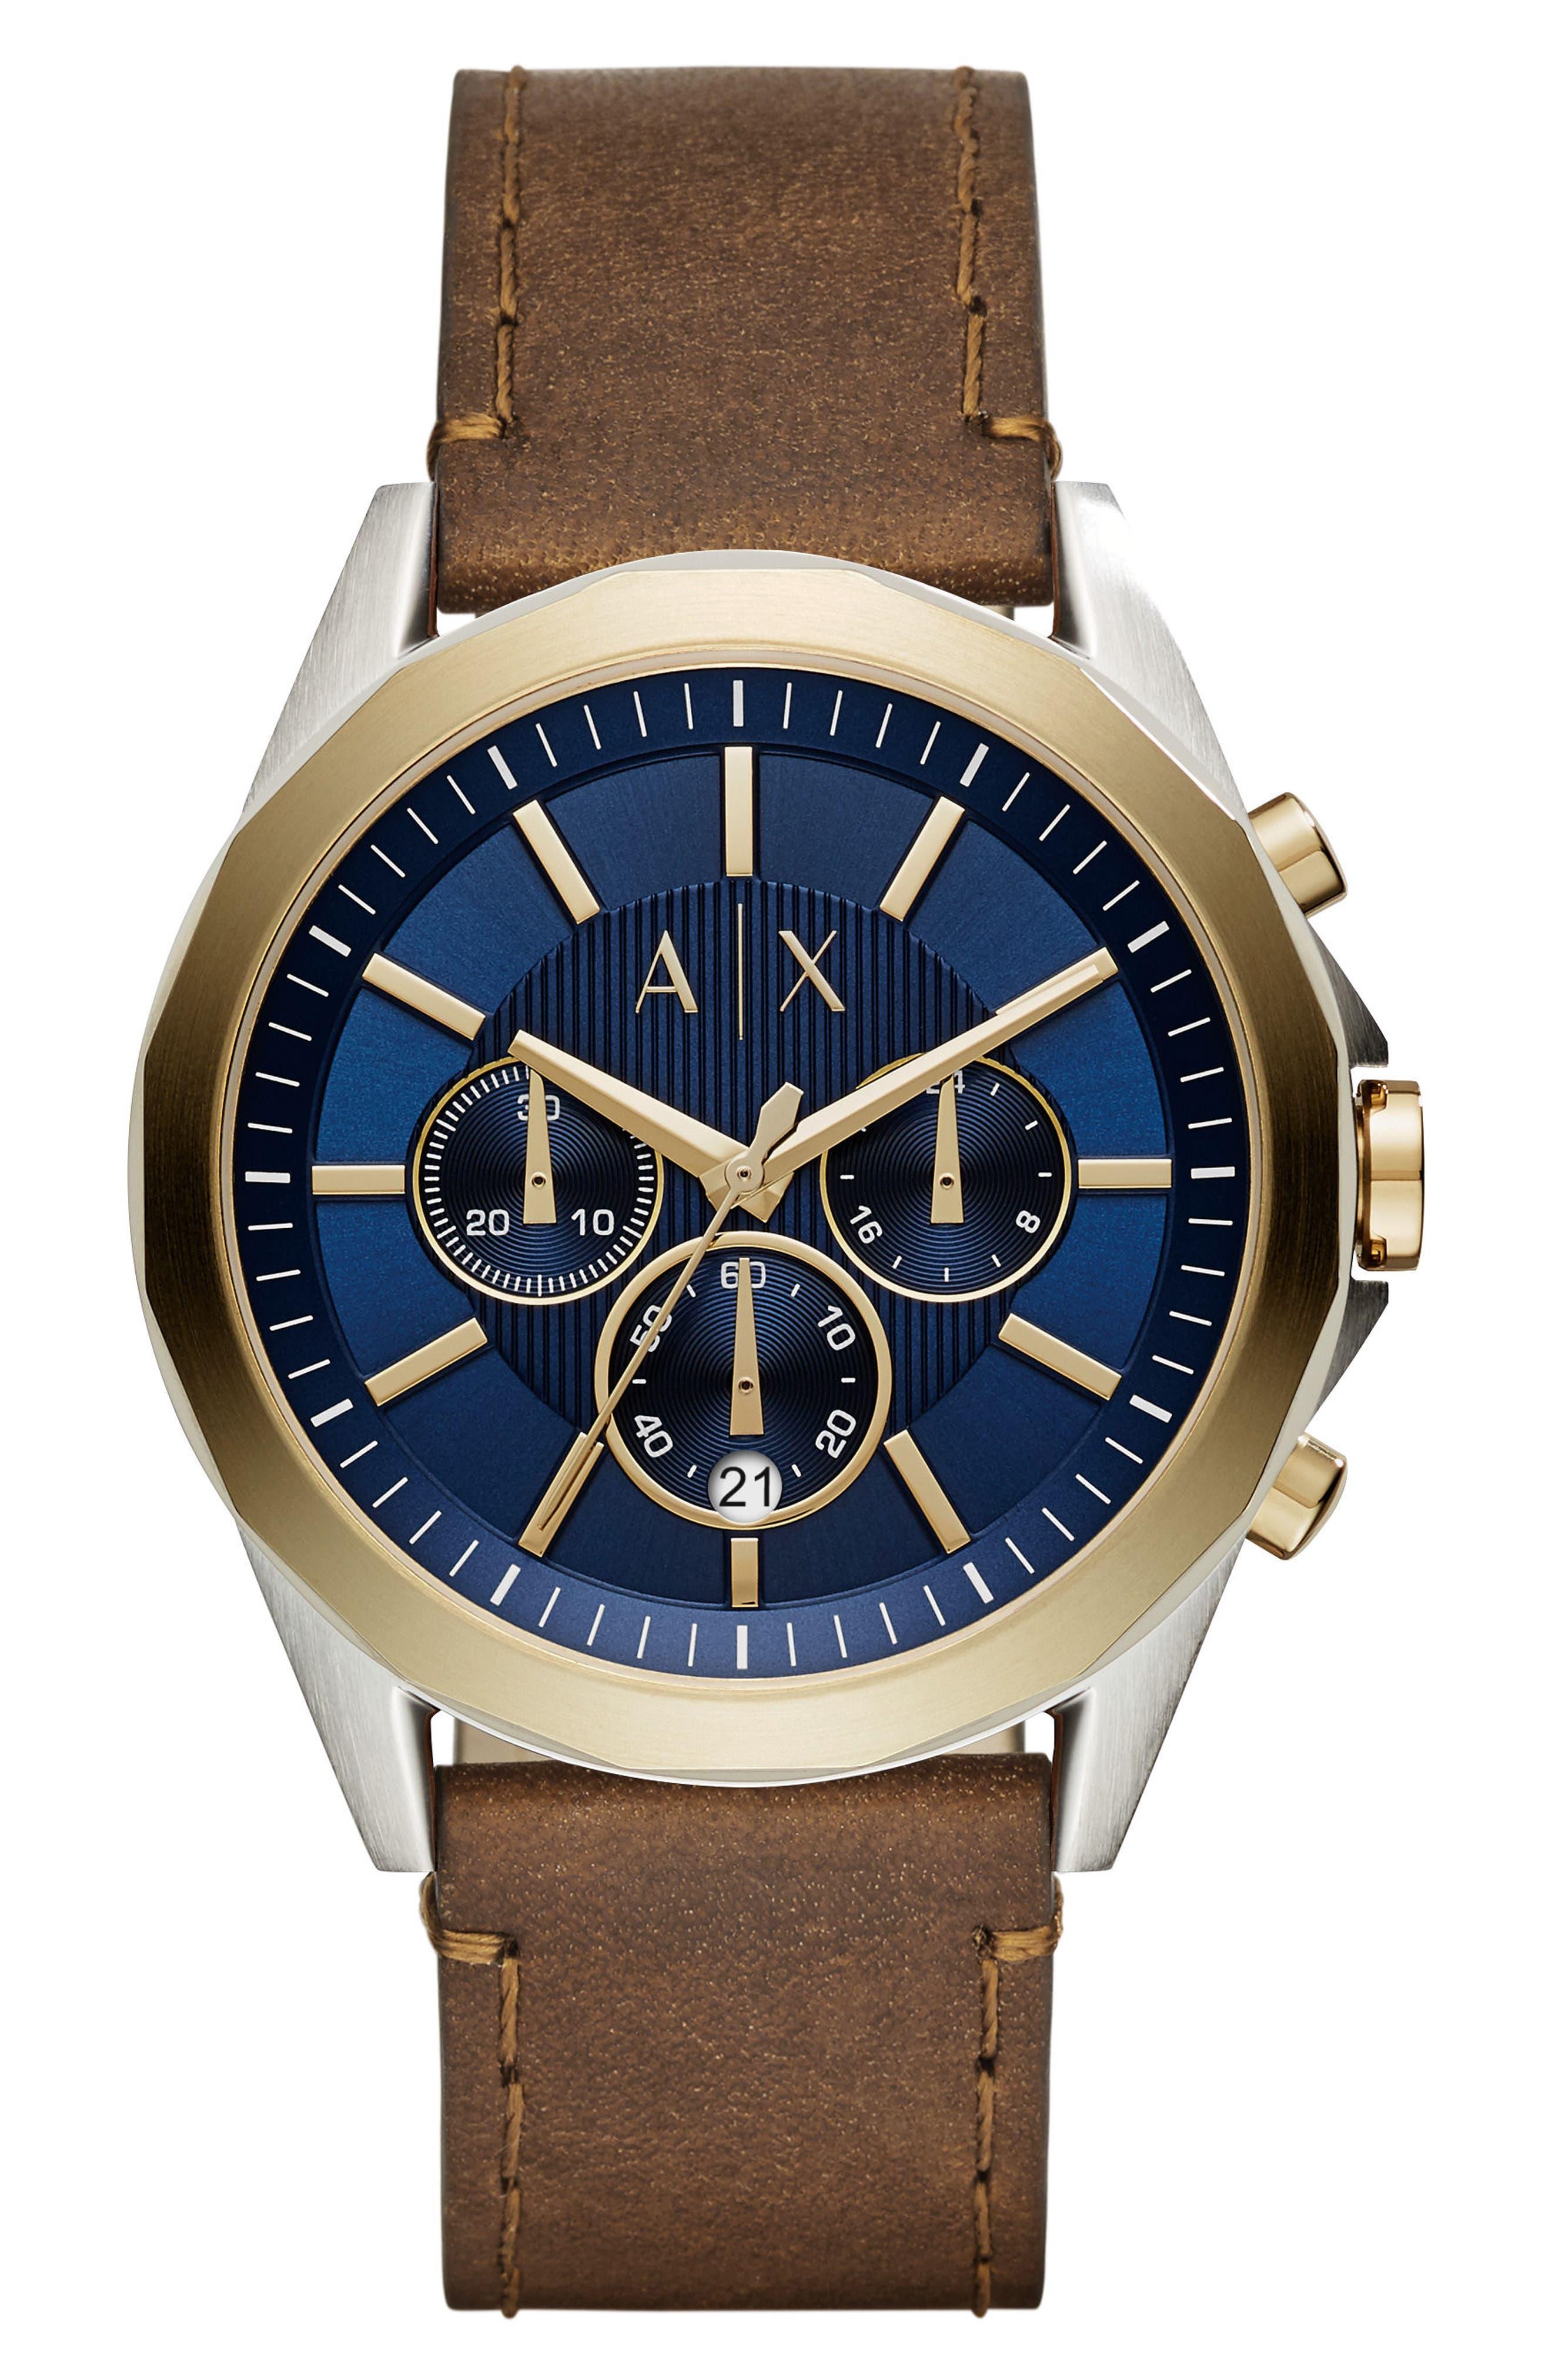 Main Image - AX Armani Exchange Chronograph Leather Strap Watch, 46mm